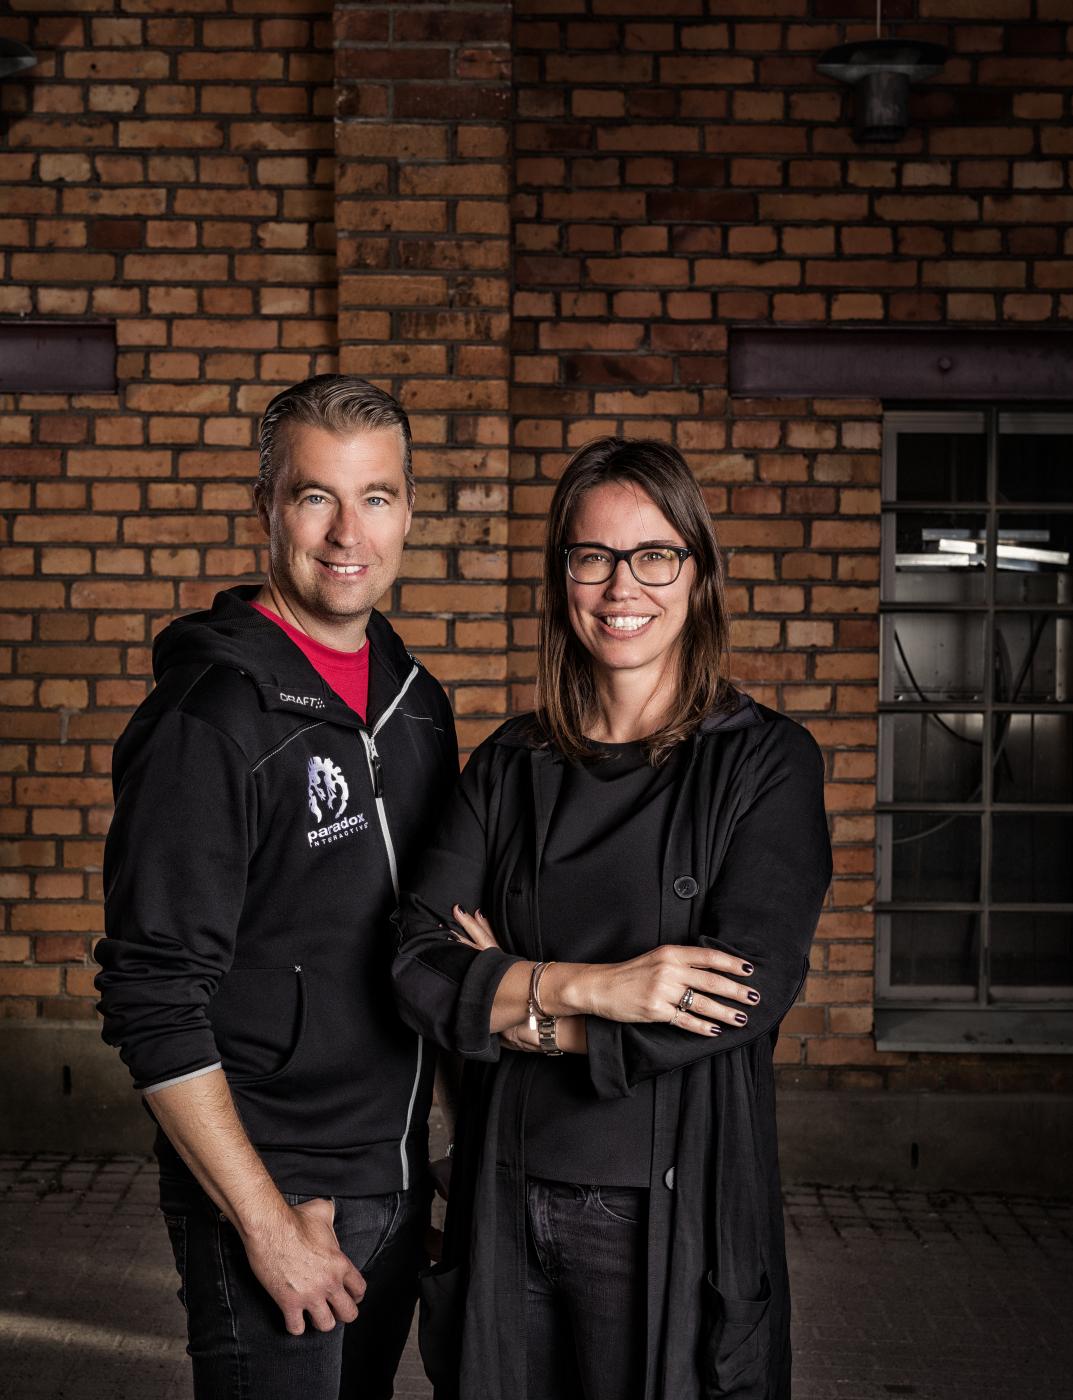 Ebba Ljungerud and Fredrik Wester